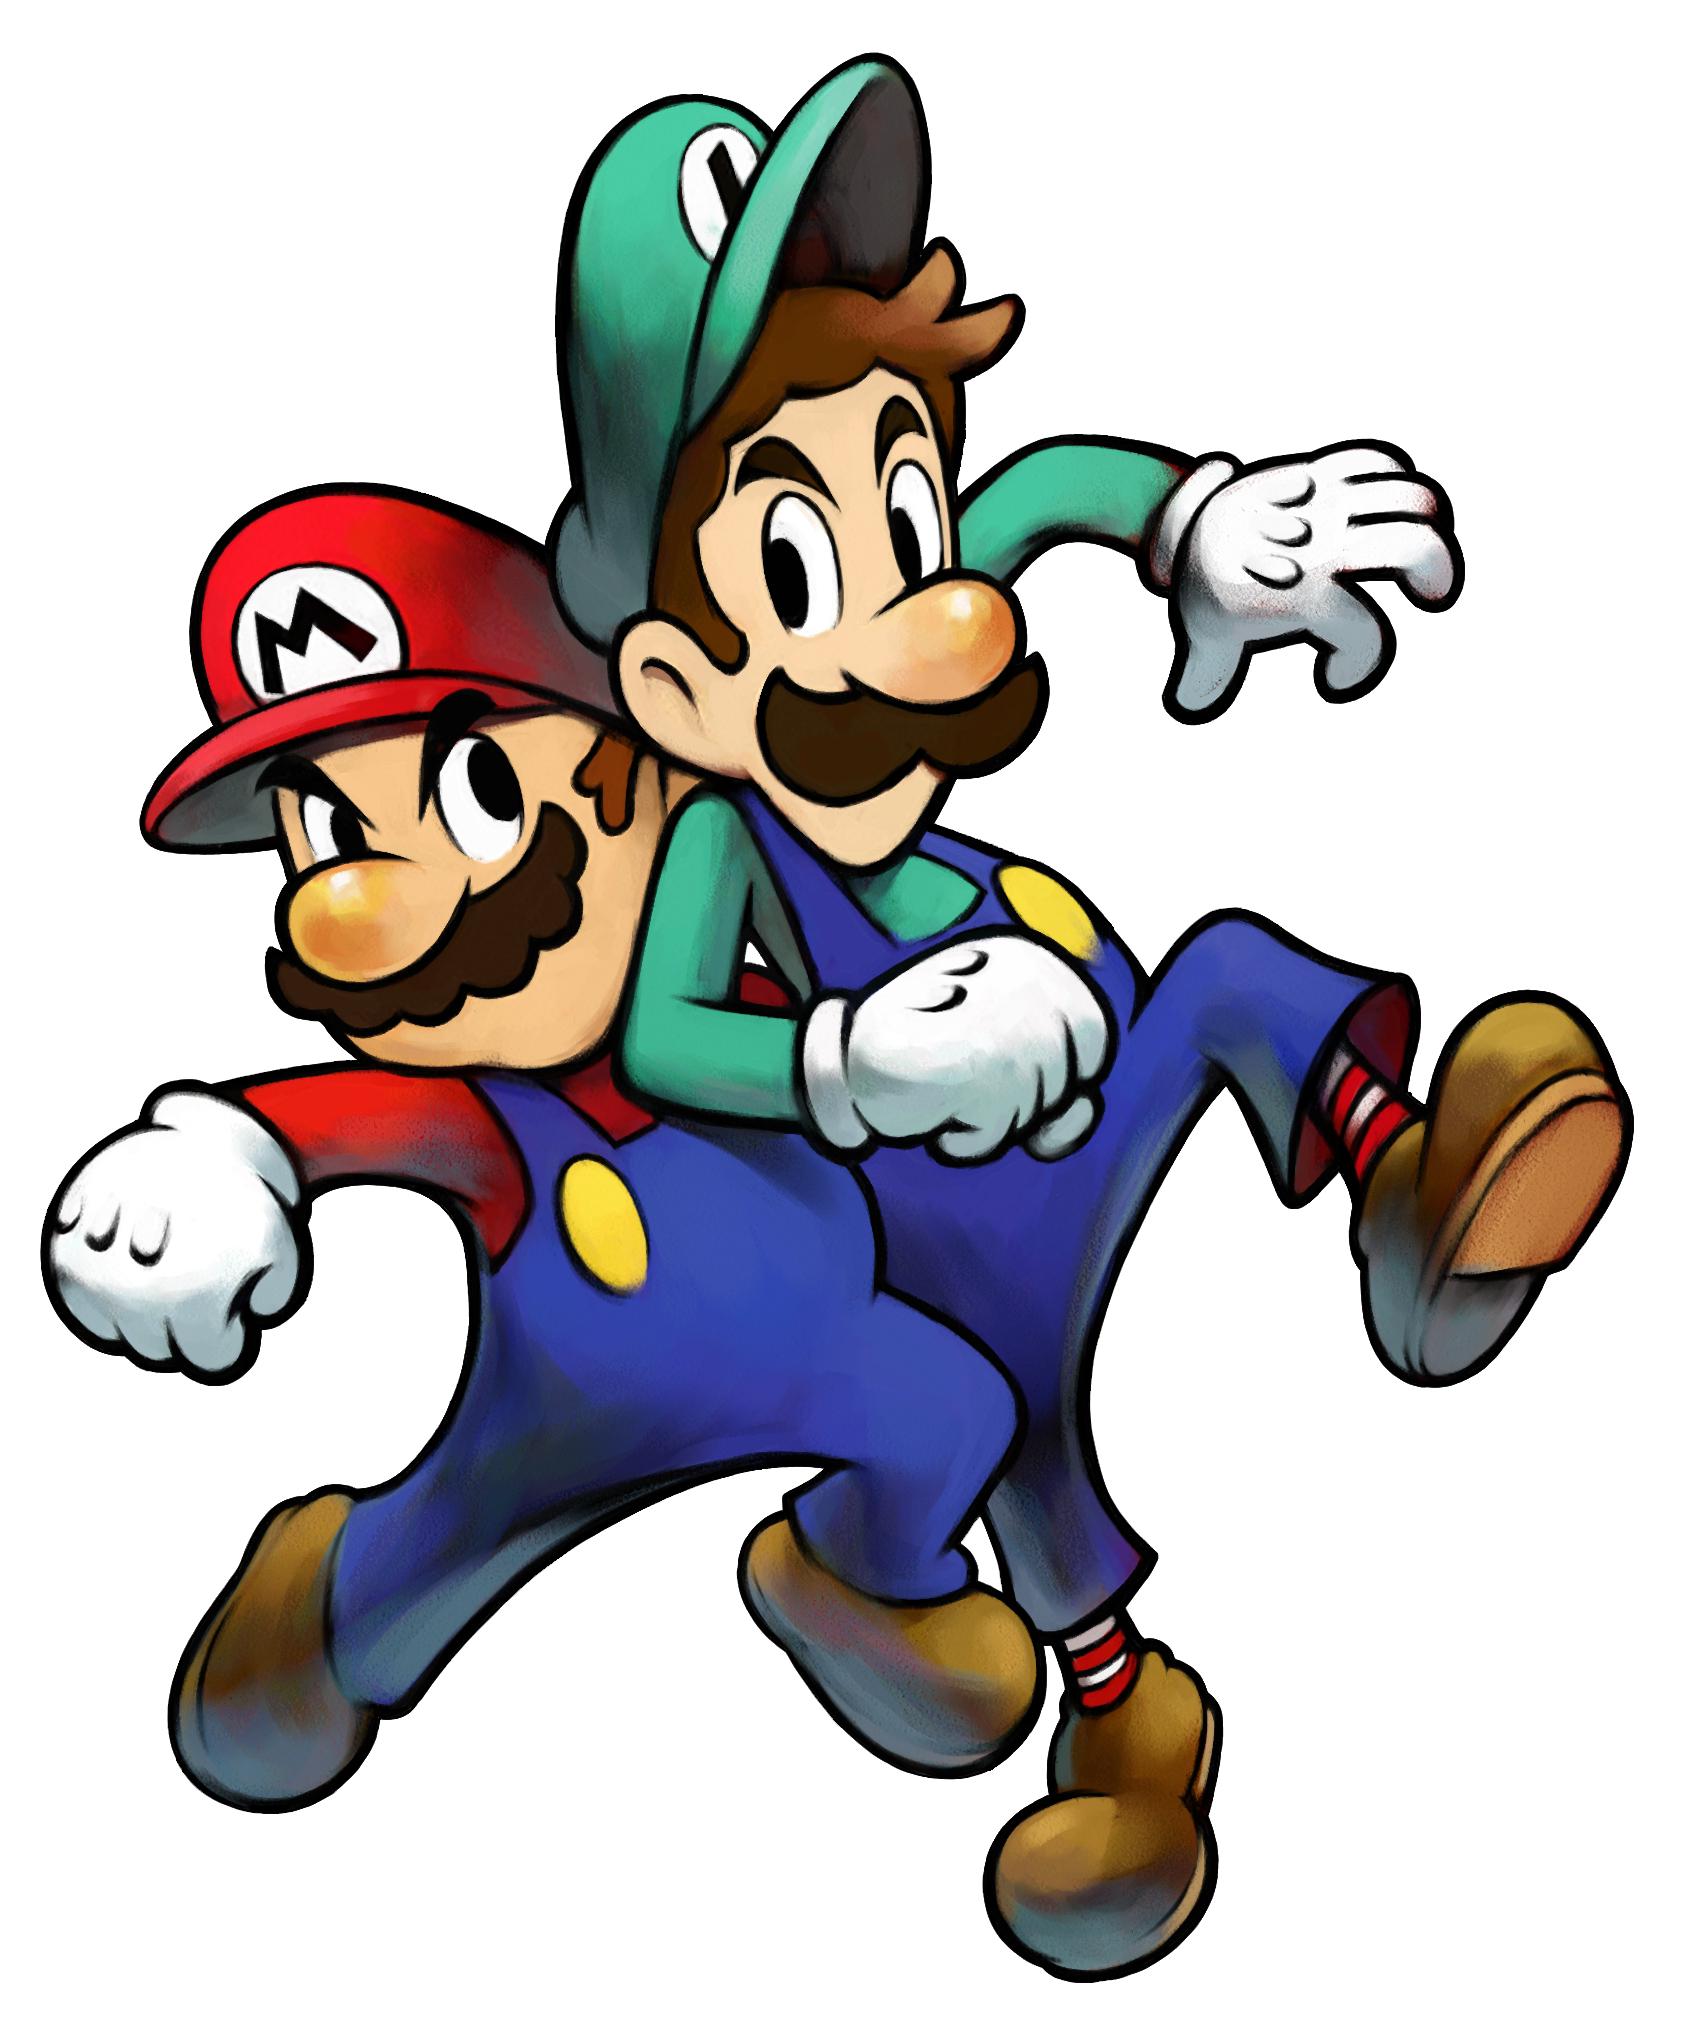 1700x2043 Unbeatable Duo Mario And Luigi Db Dokfanbattle Wiki Fandom